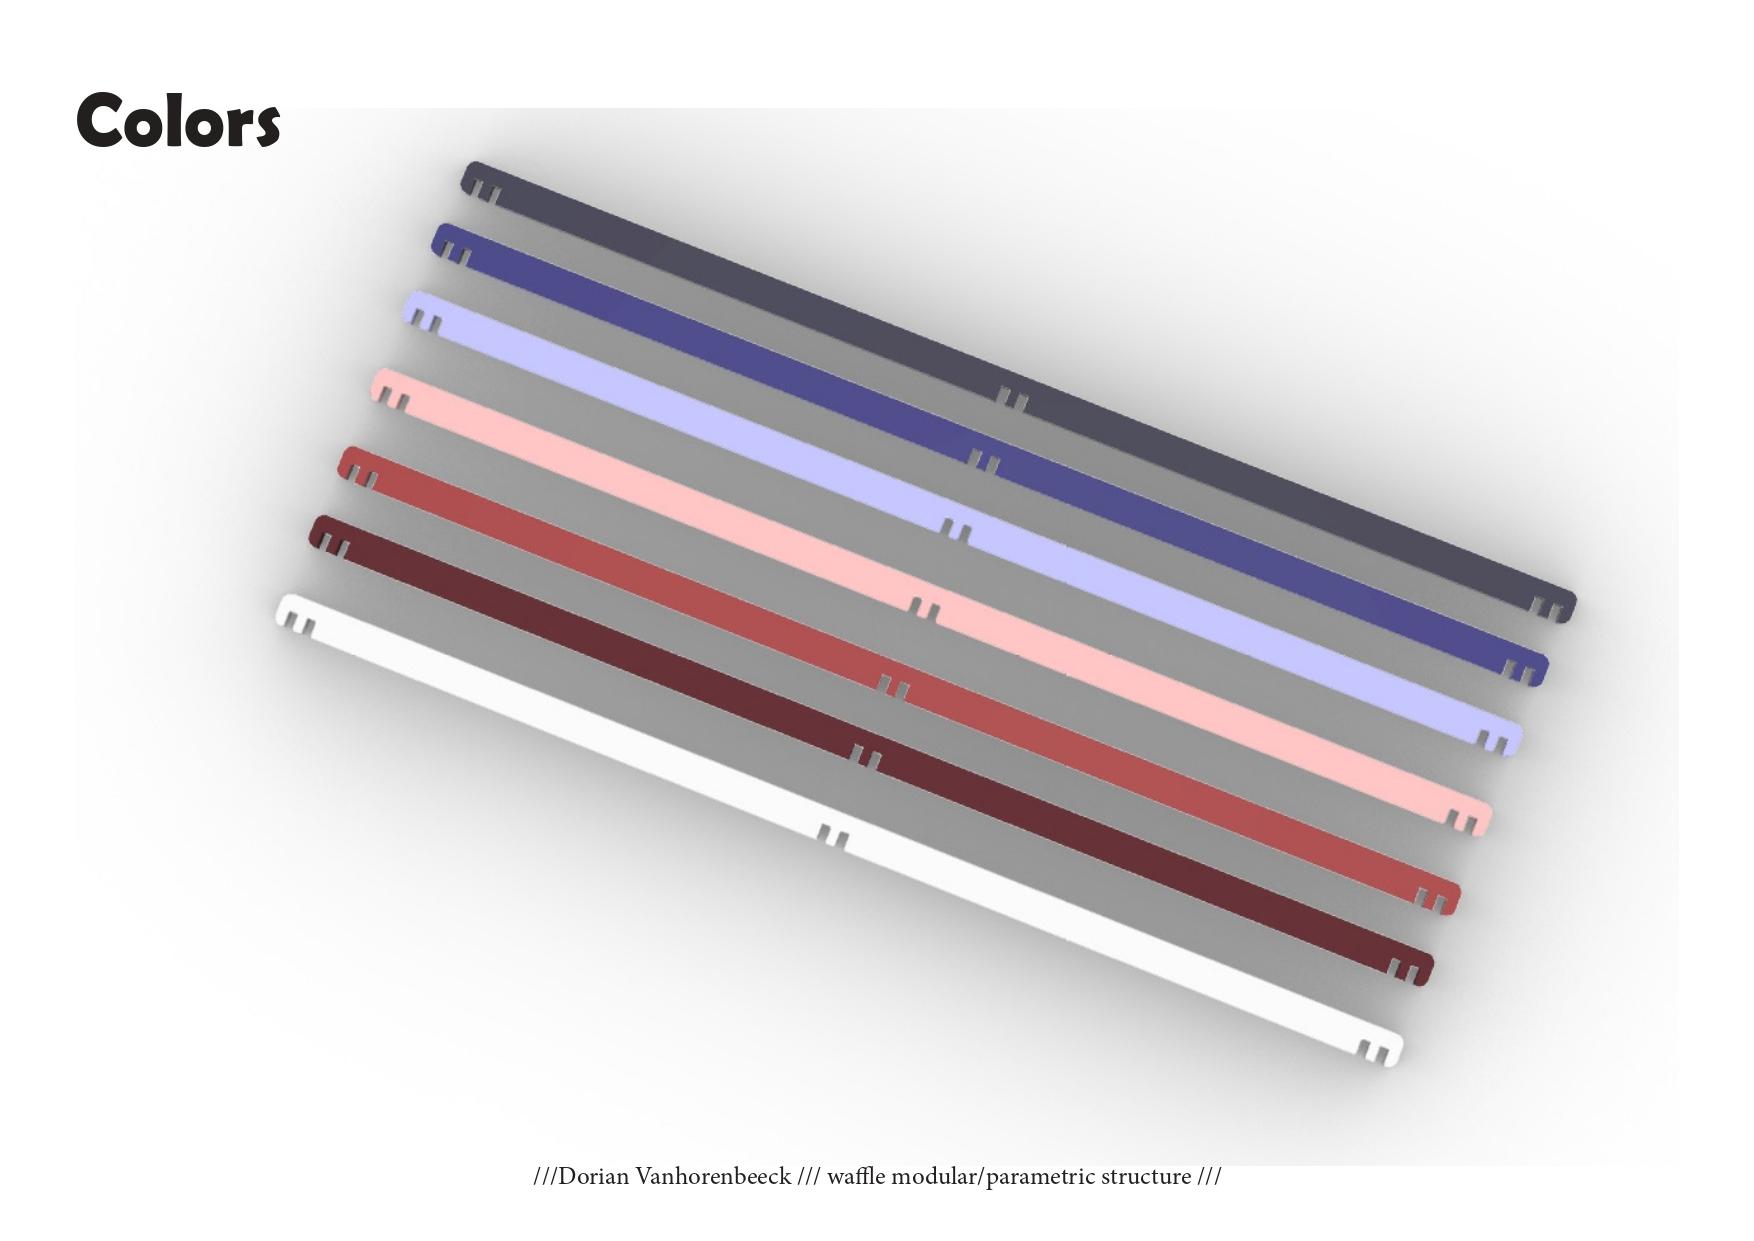 Livret Waffle modular-parametric Structure Dorian Vanhorenbeeck_page-0011